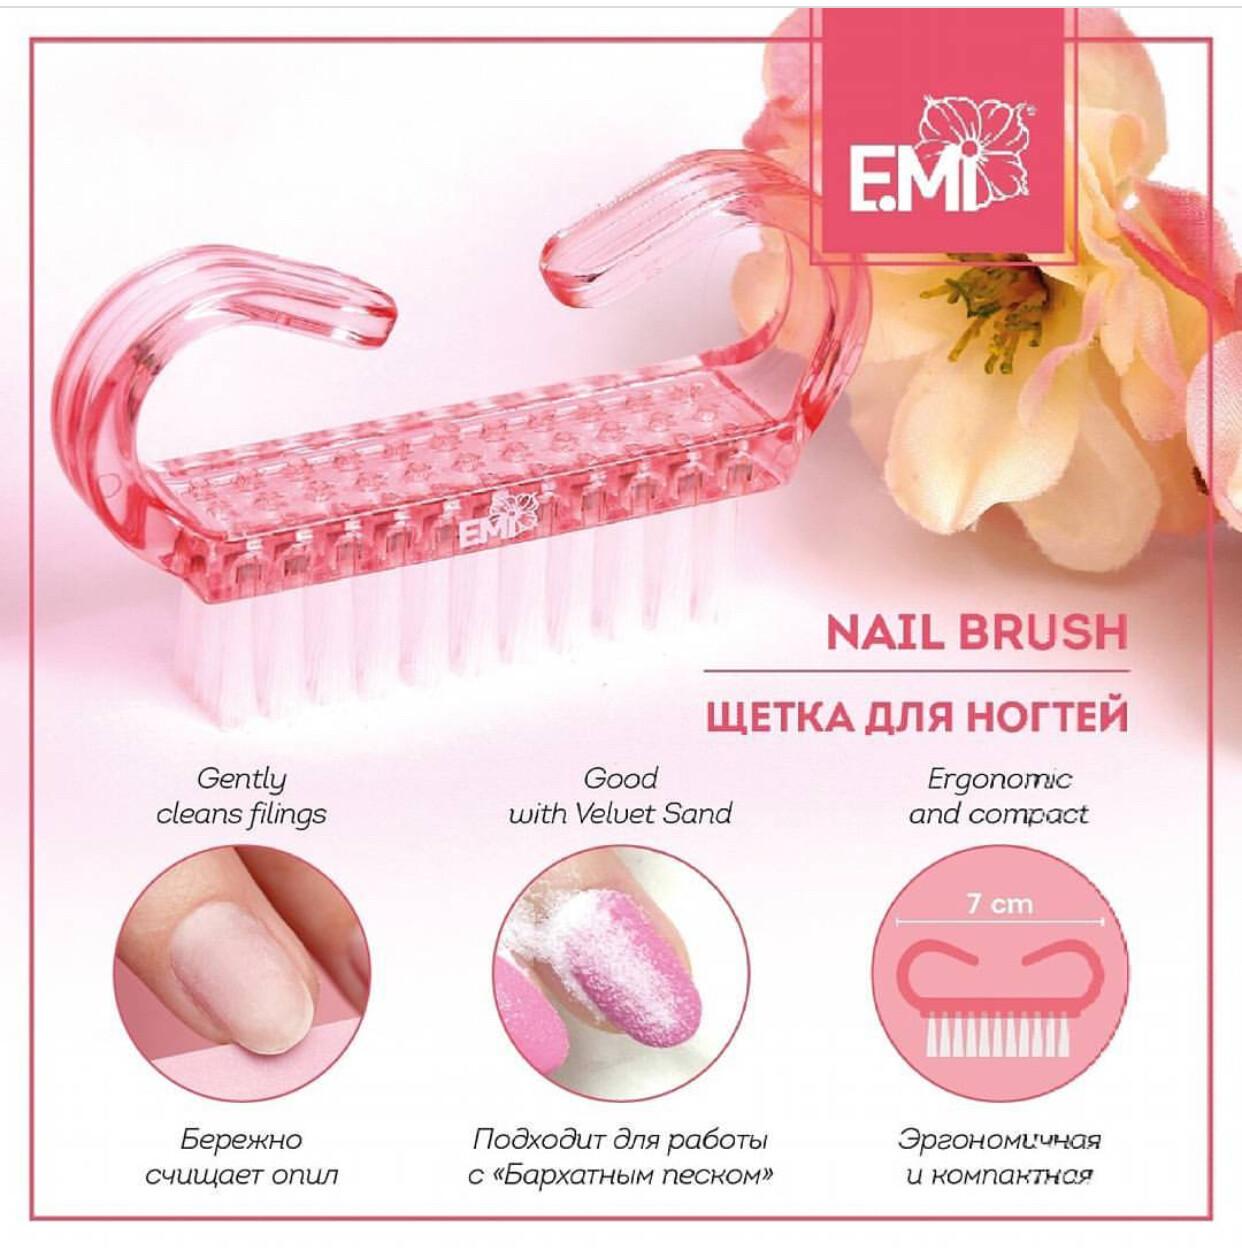 Brush with E.Mi logo